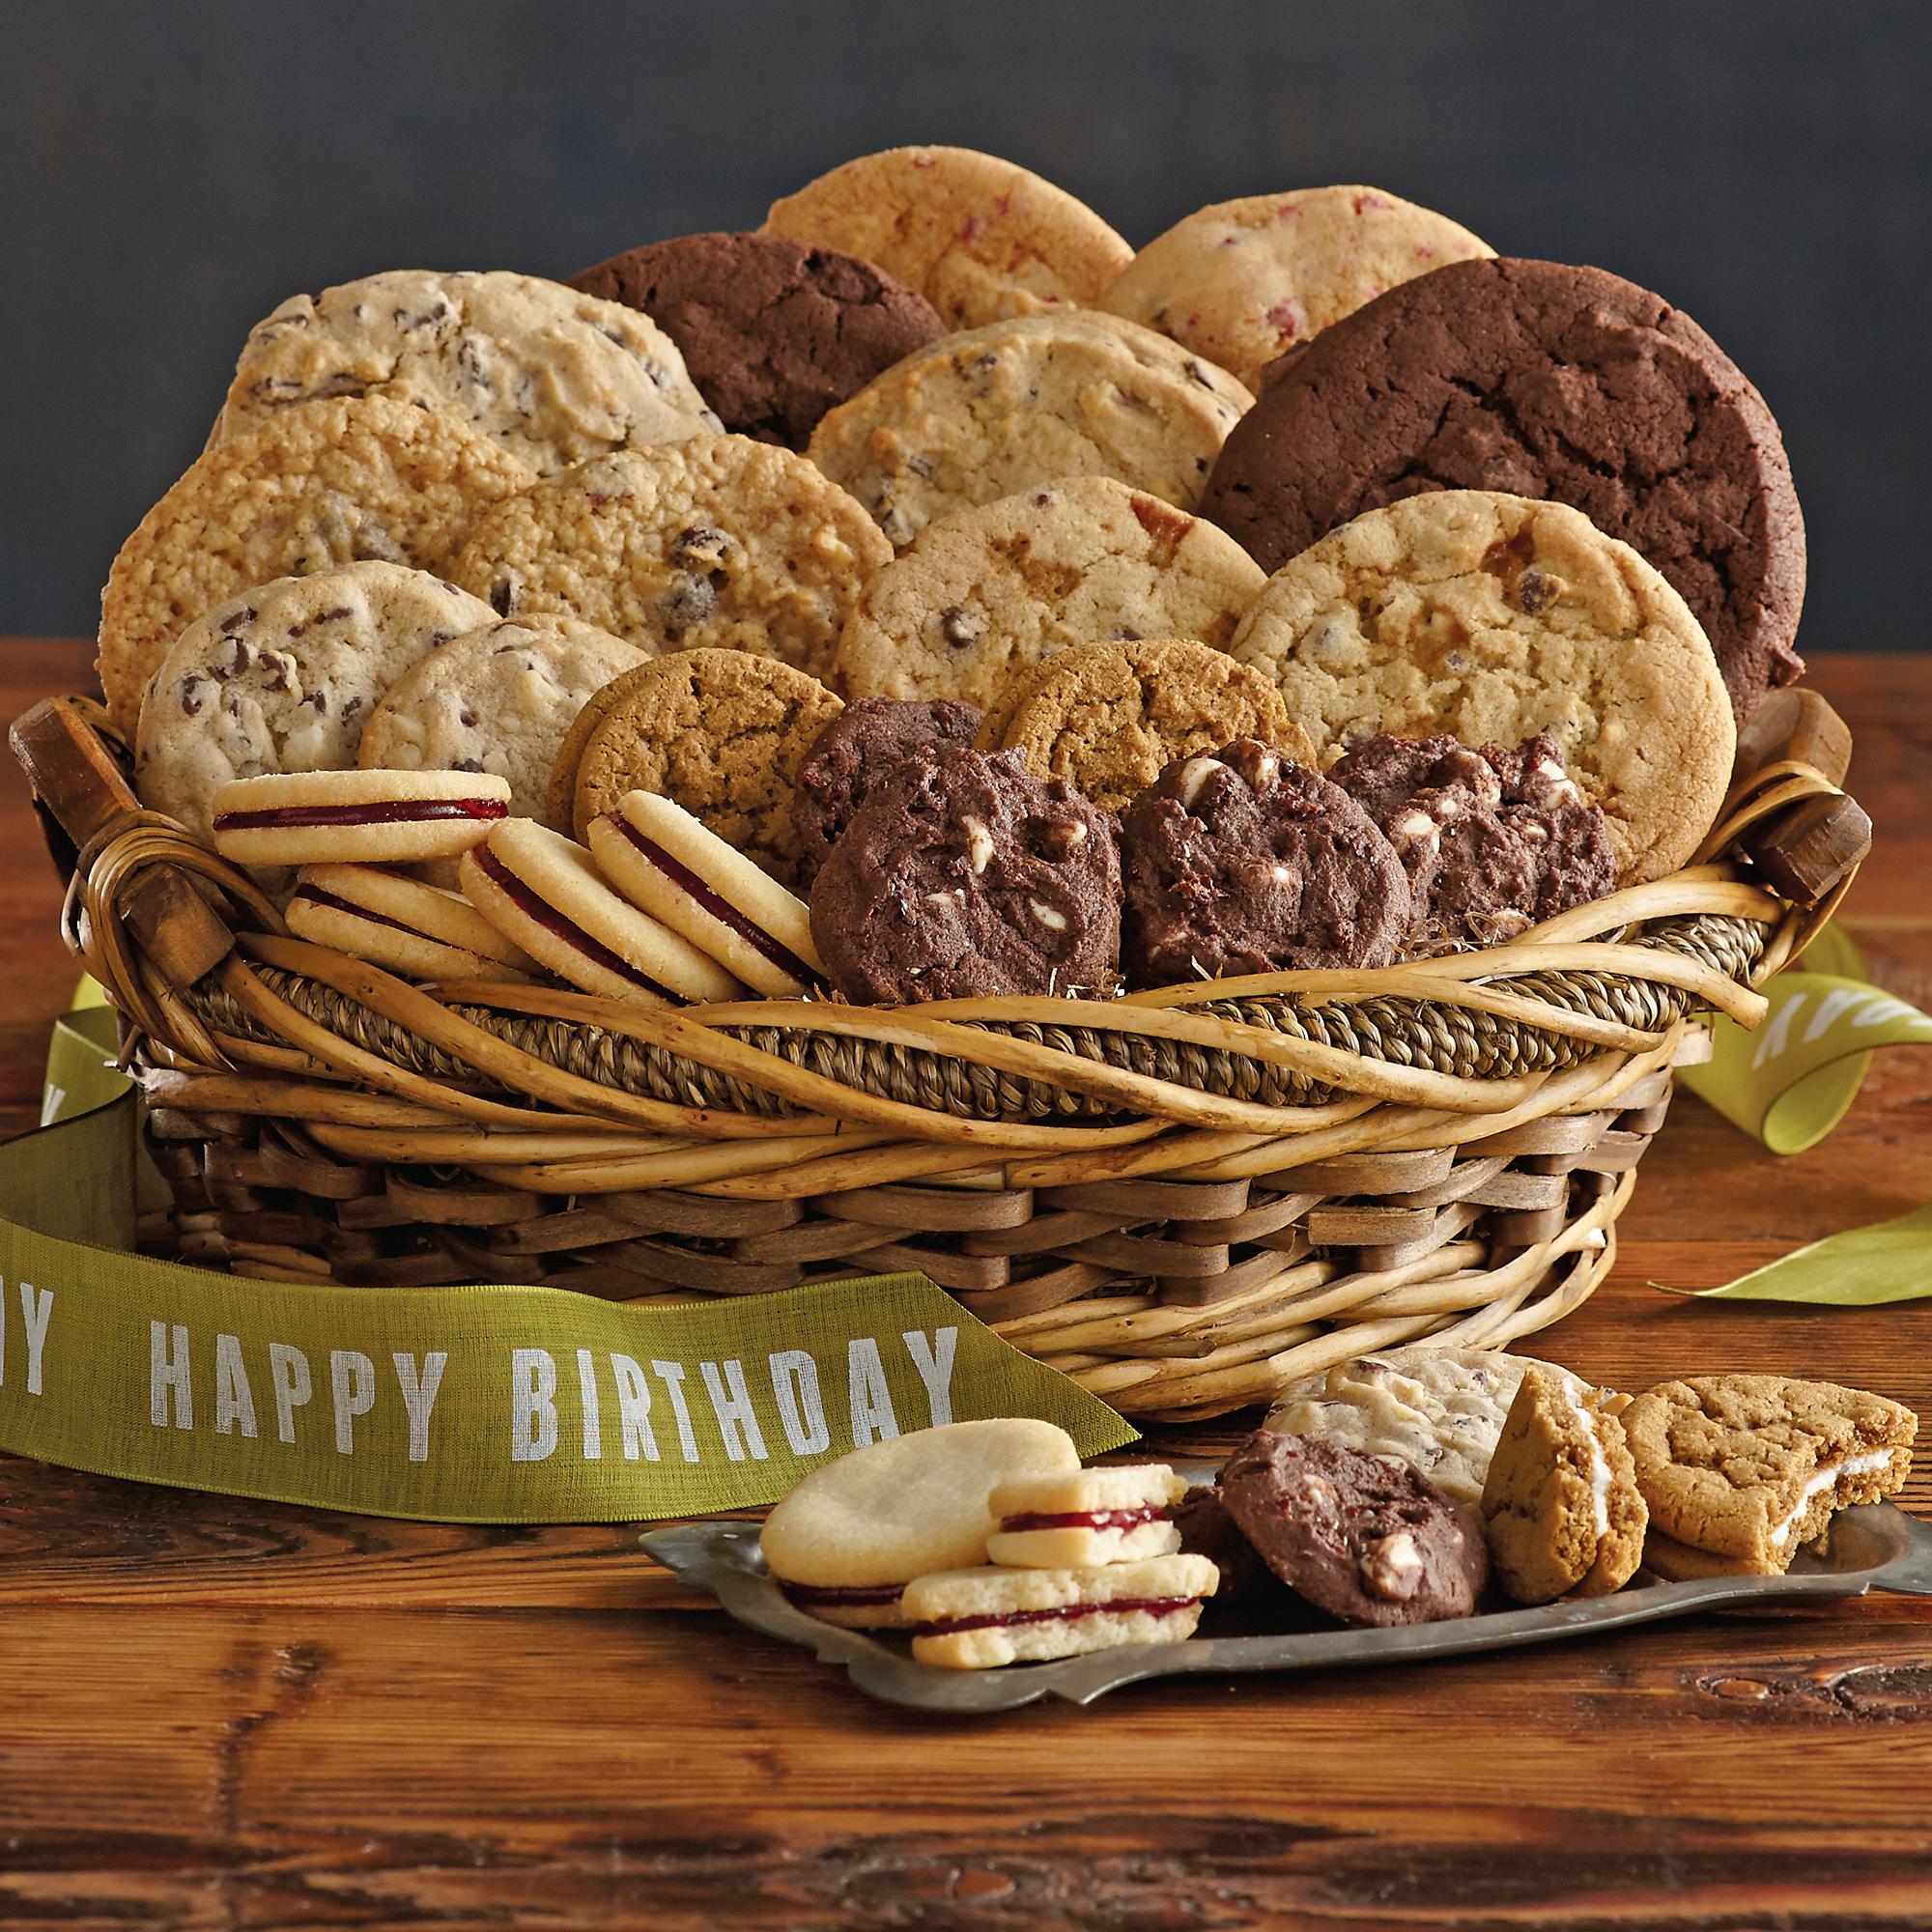 Harry And David Birthday Gift Baskets : Birthday cookie gift basket cookies and brownies harry